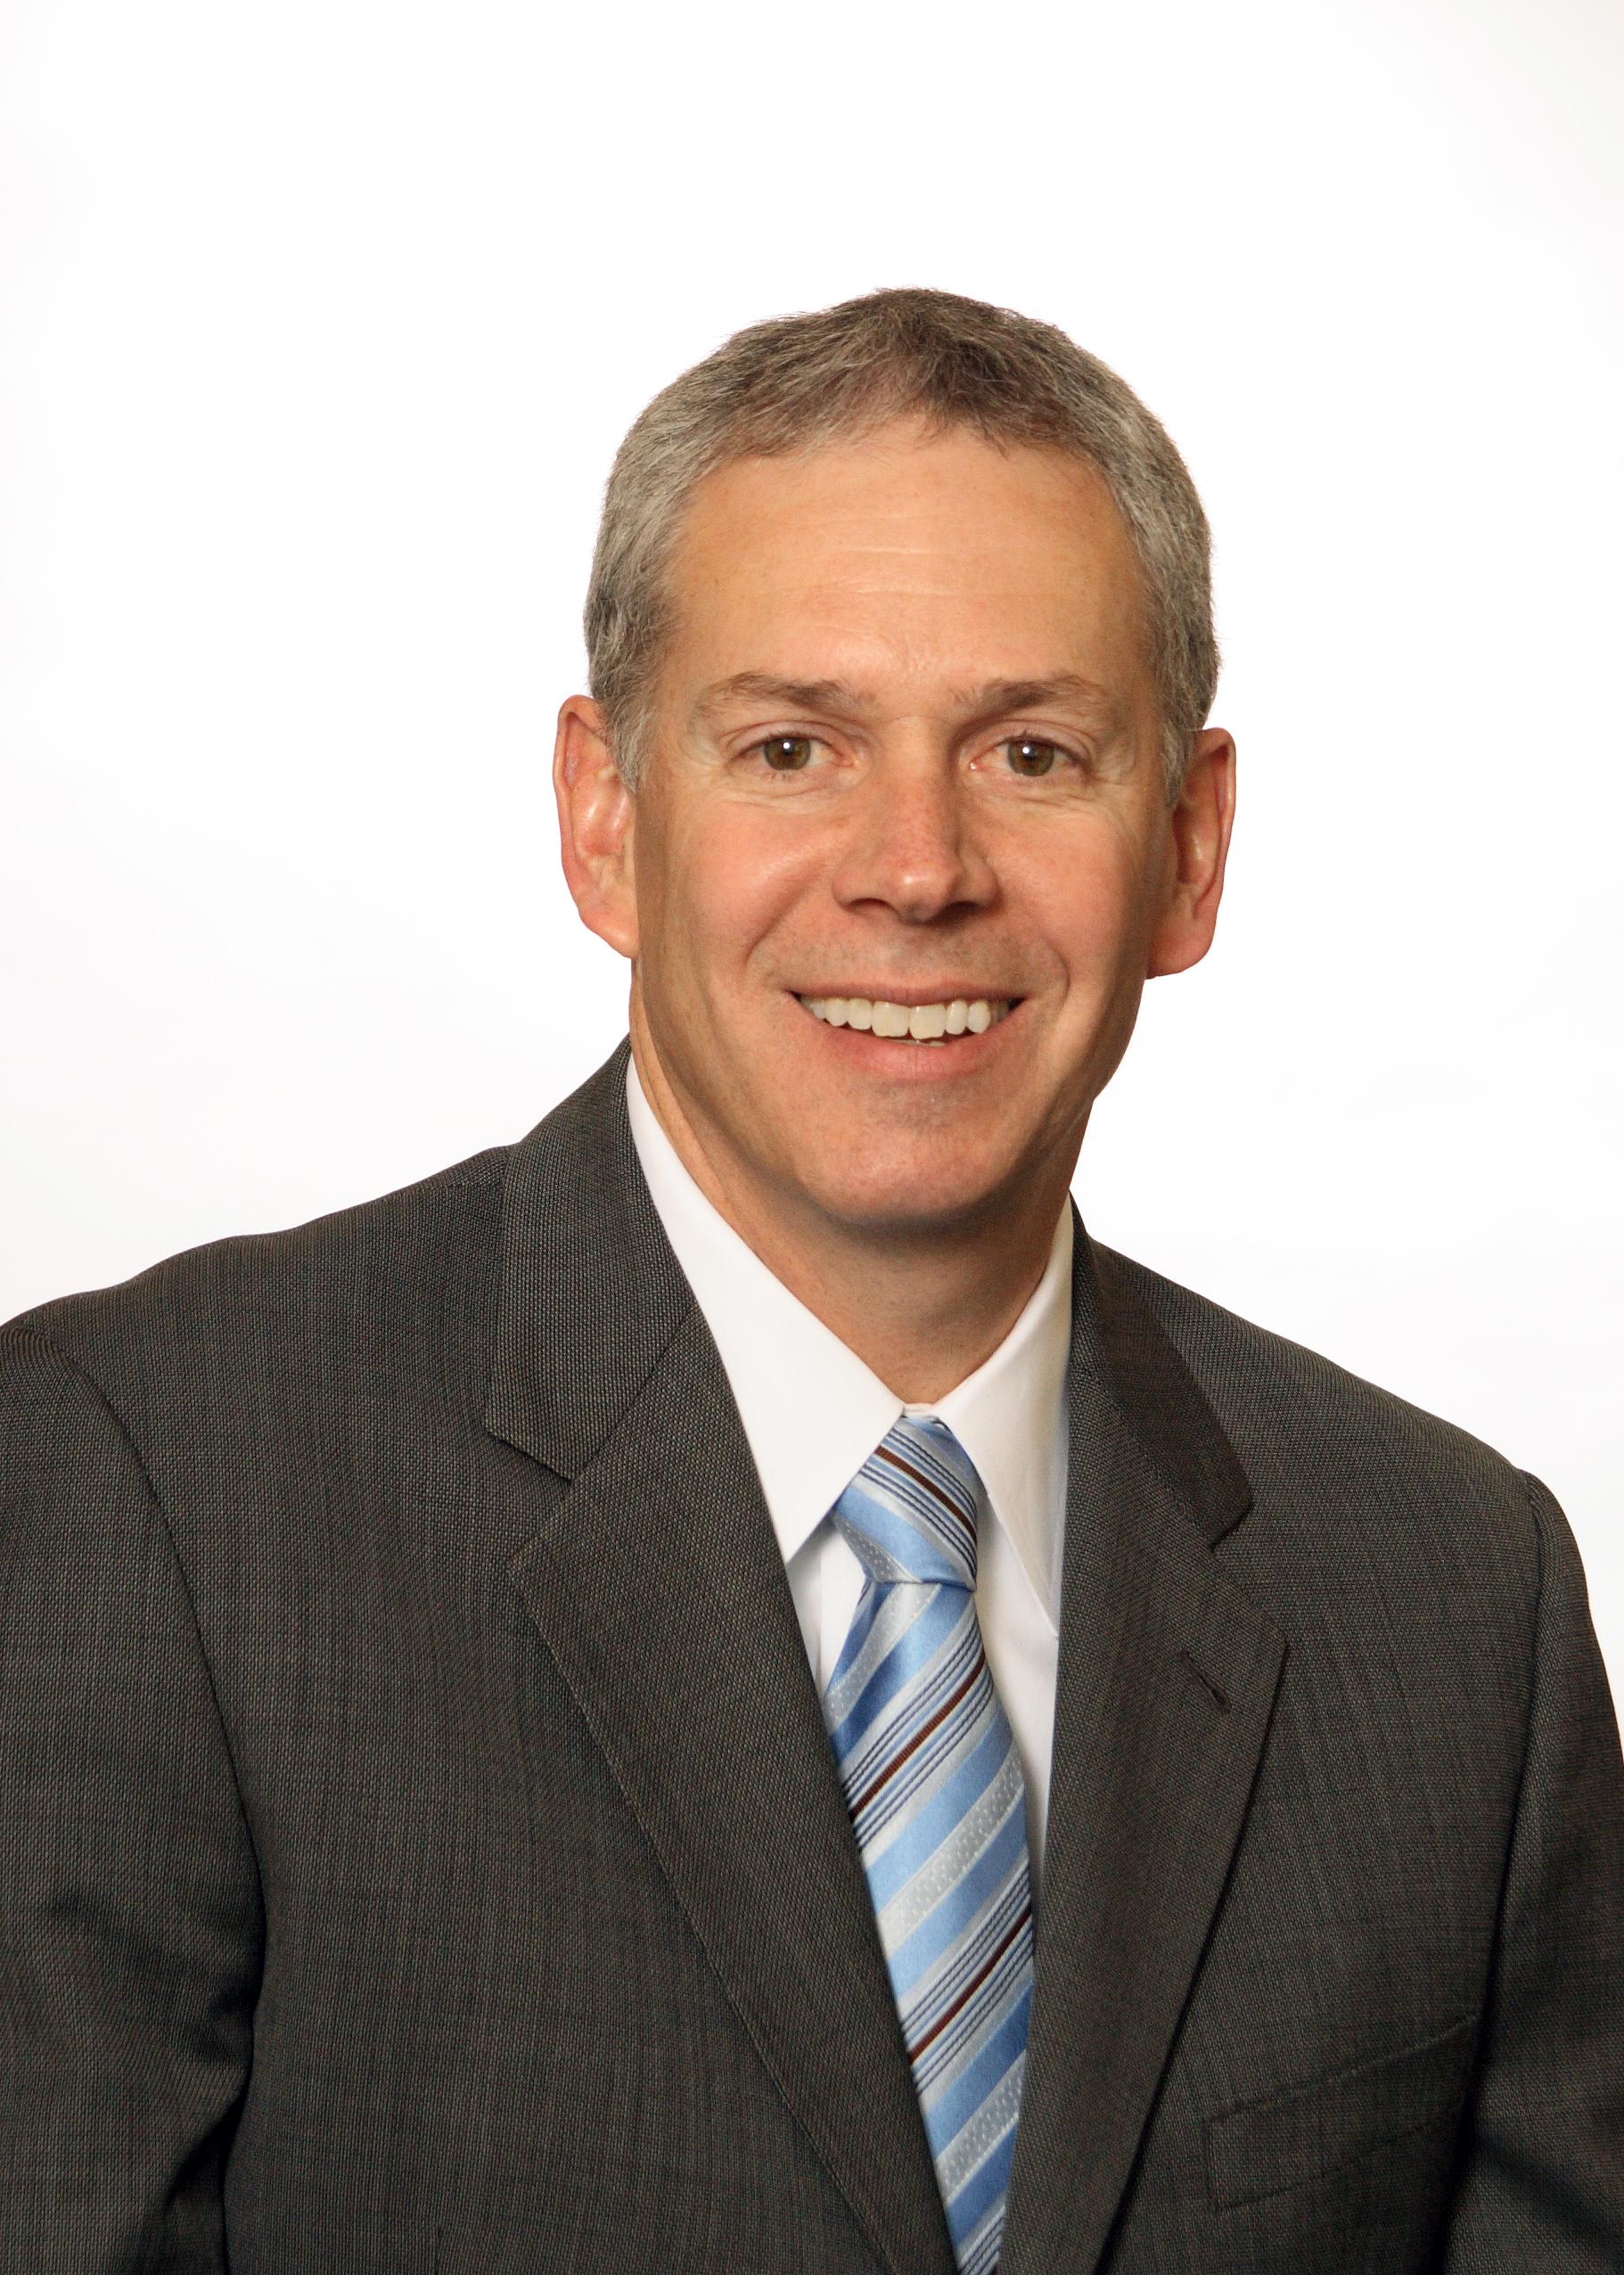 Kevan P. Lawlor headshot